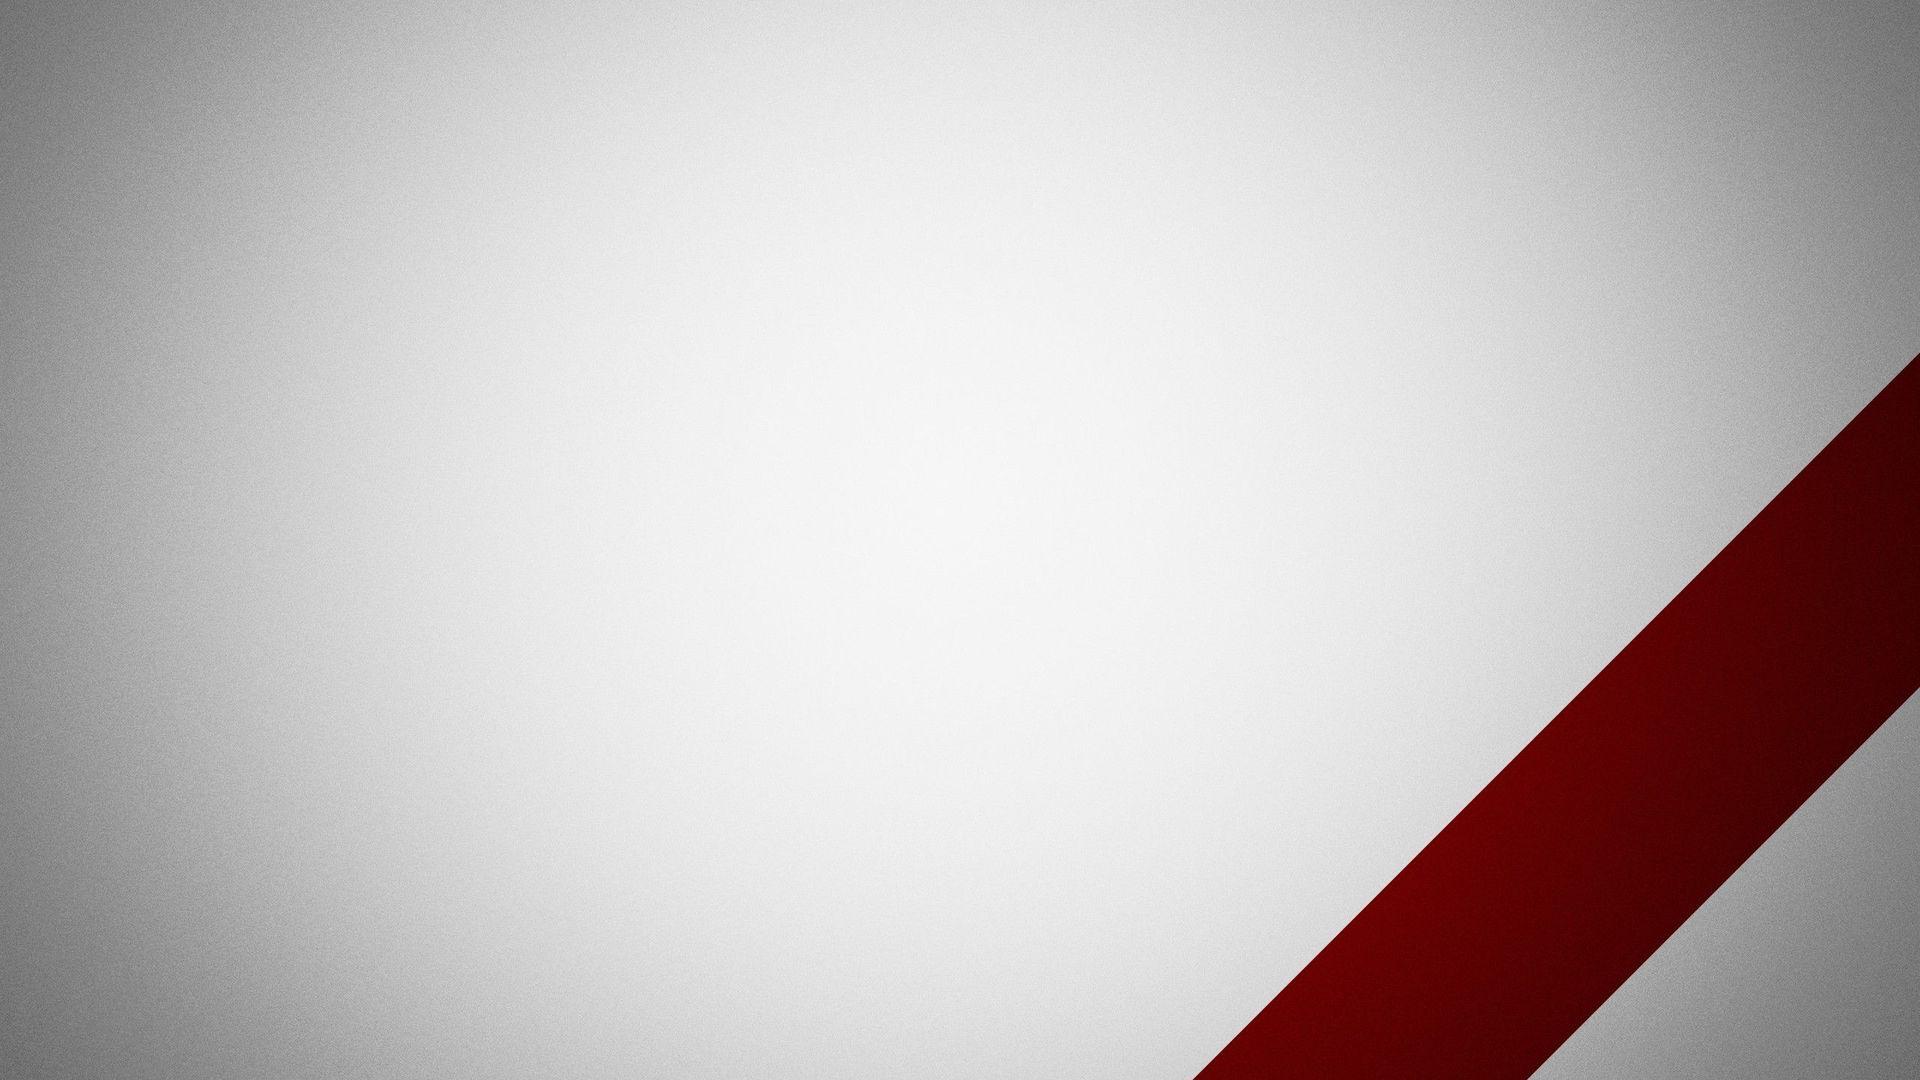 single-red-stripe-vector-hd-wallpaper-1920x1080-7151